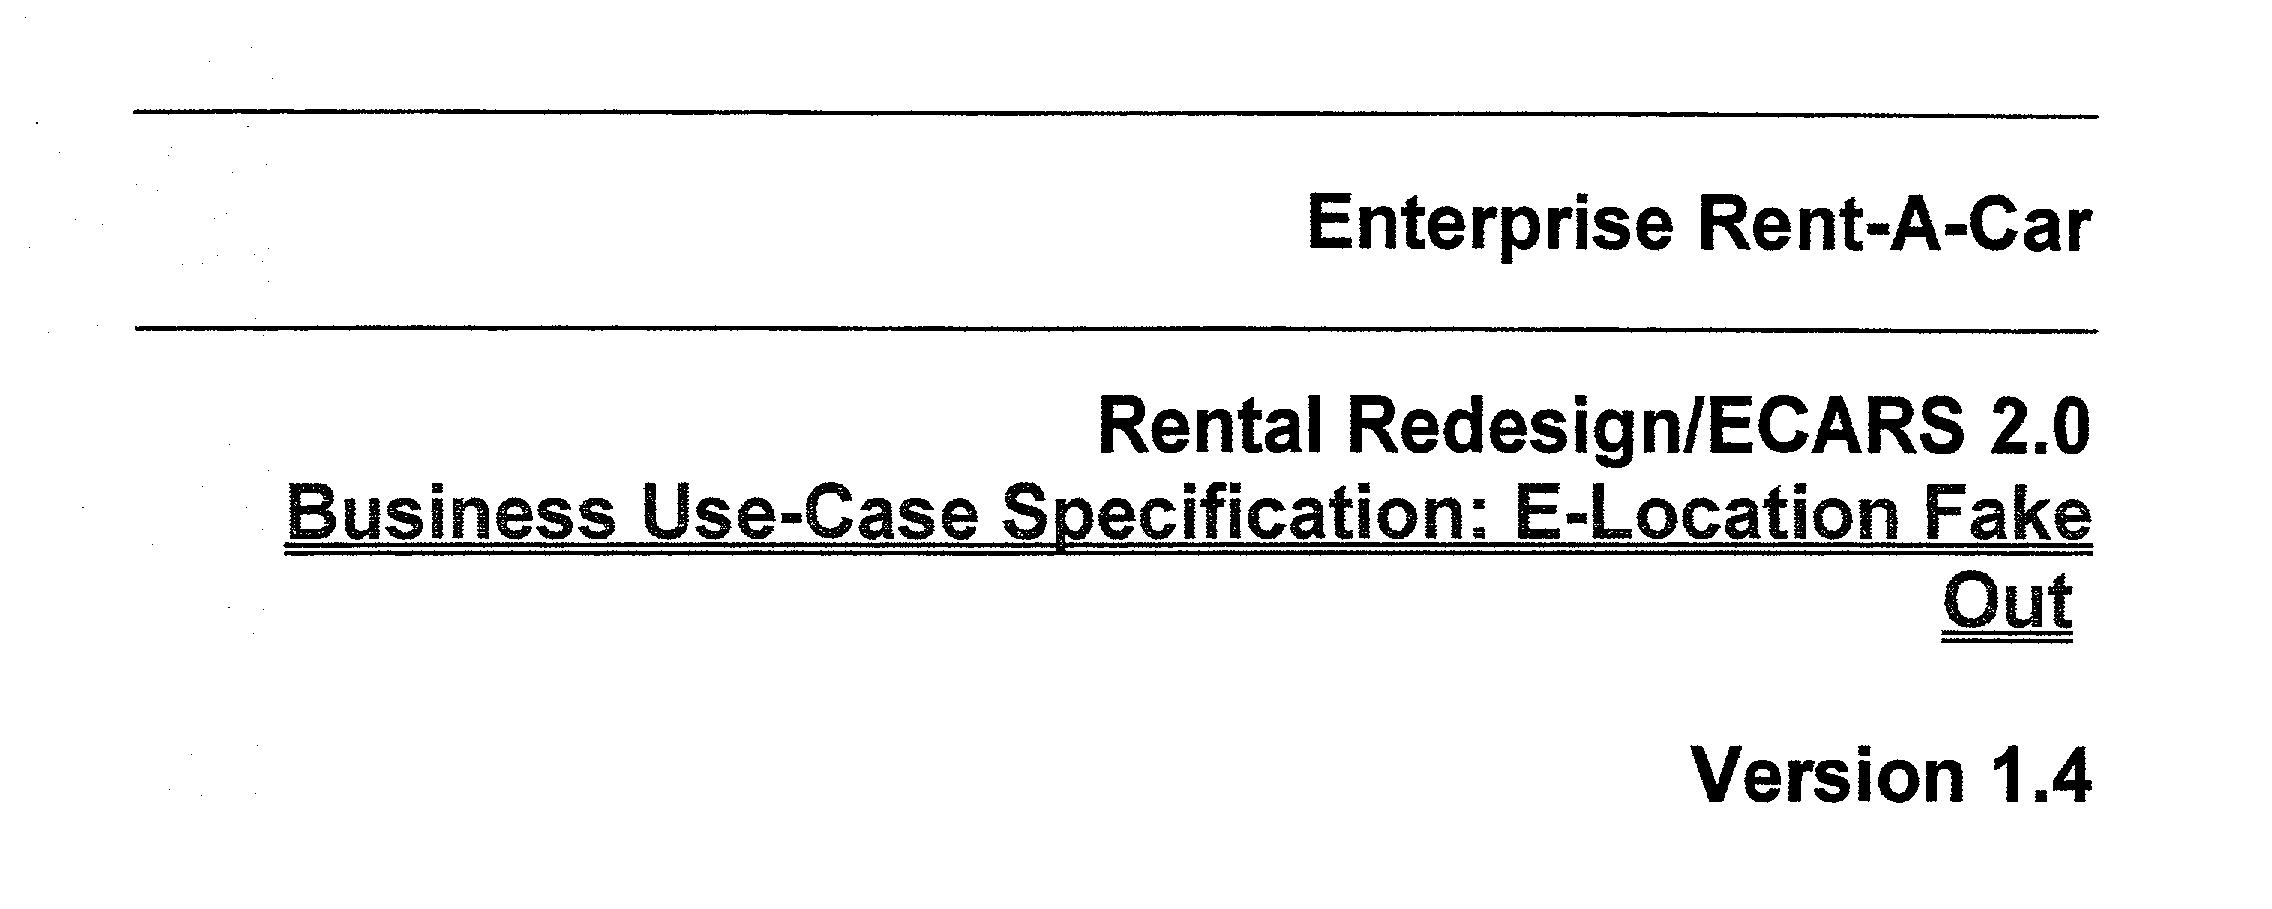 Figure US20030125992A1-20030703-P01301